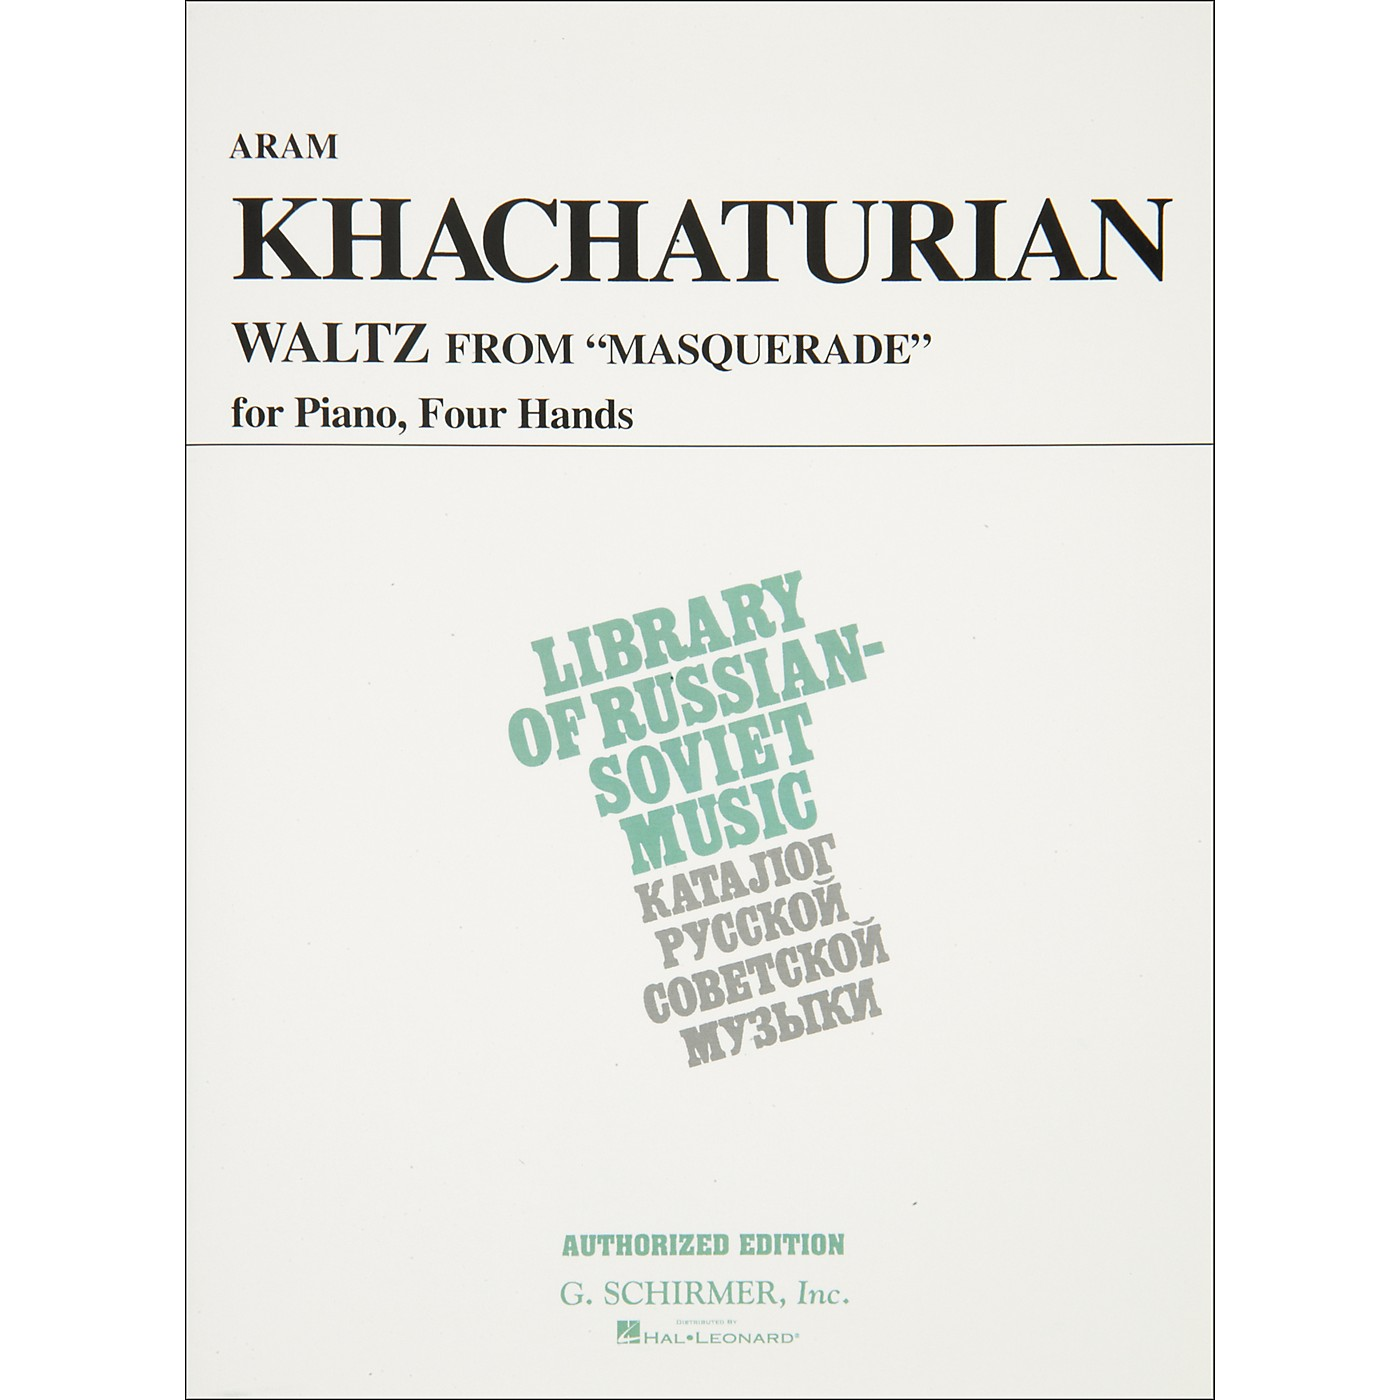 Hal Leonard Waltz From Masquerade Piano 4 Hands Vaap Edition By Khachaturian thumbnail